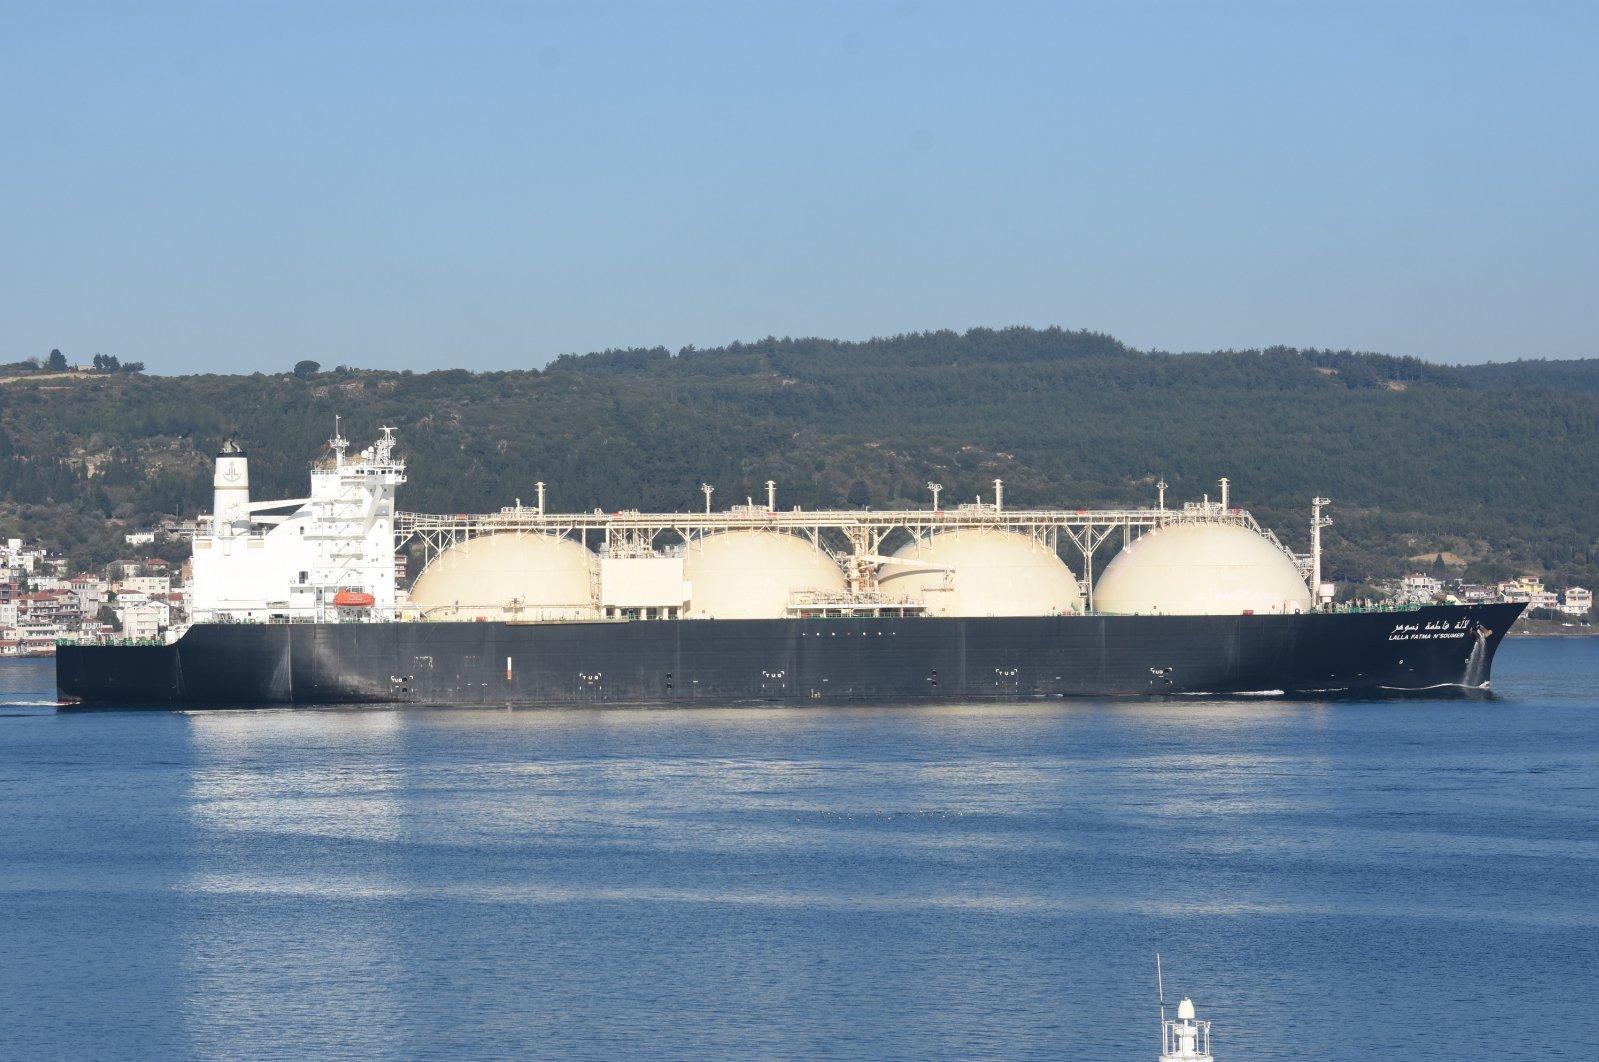 An LNG tanker passes through Çanakkale Strait, Turkey, April 25, 2020. (AA Photo)